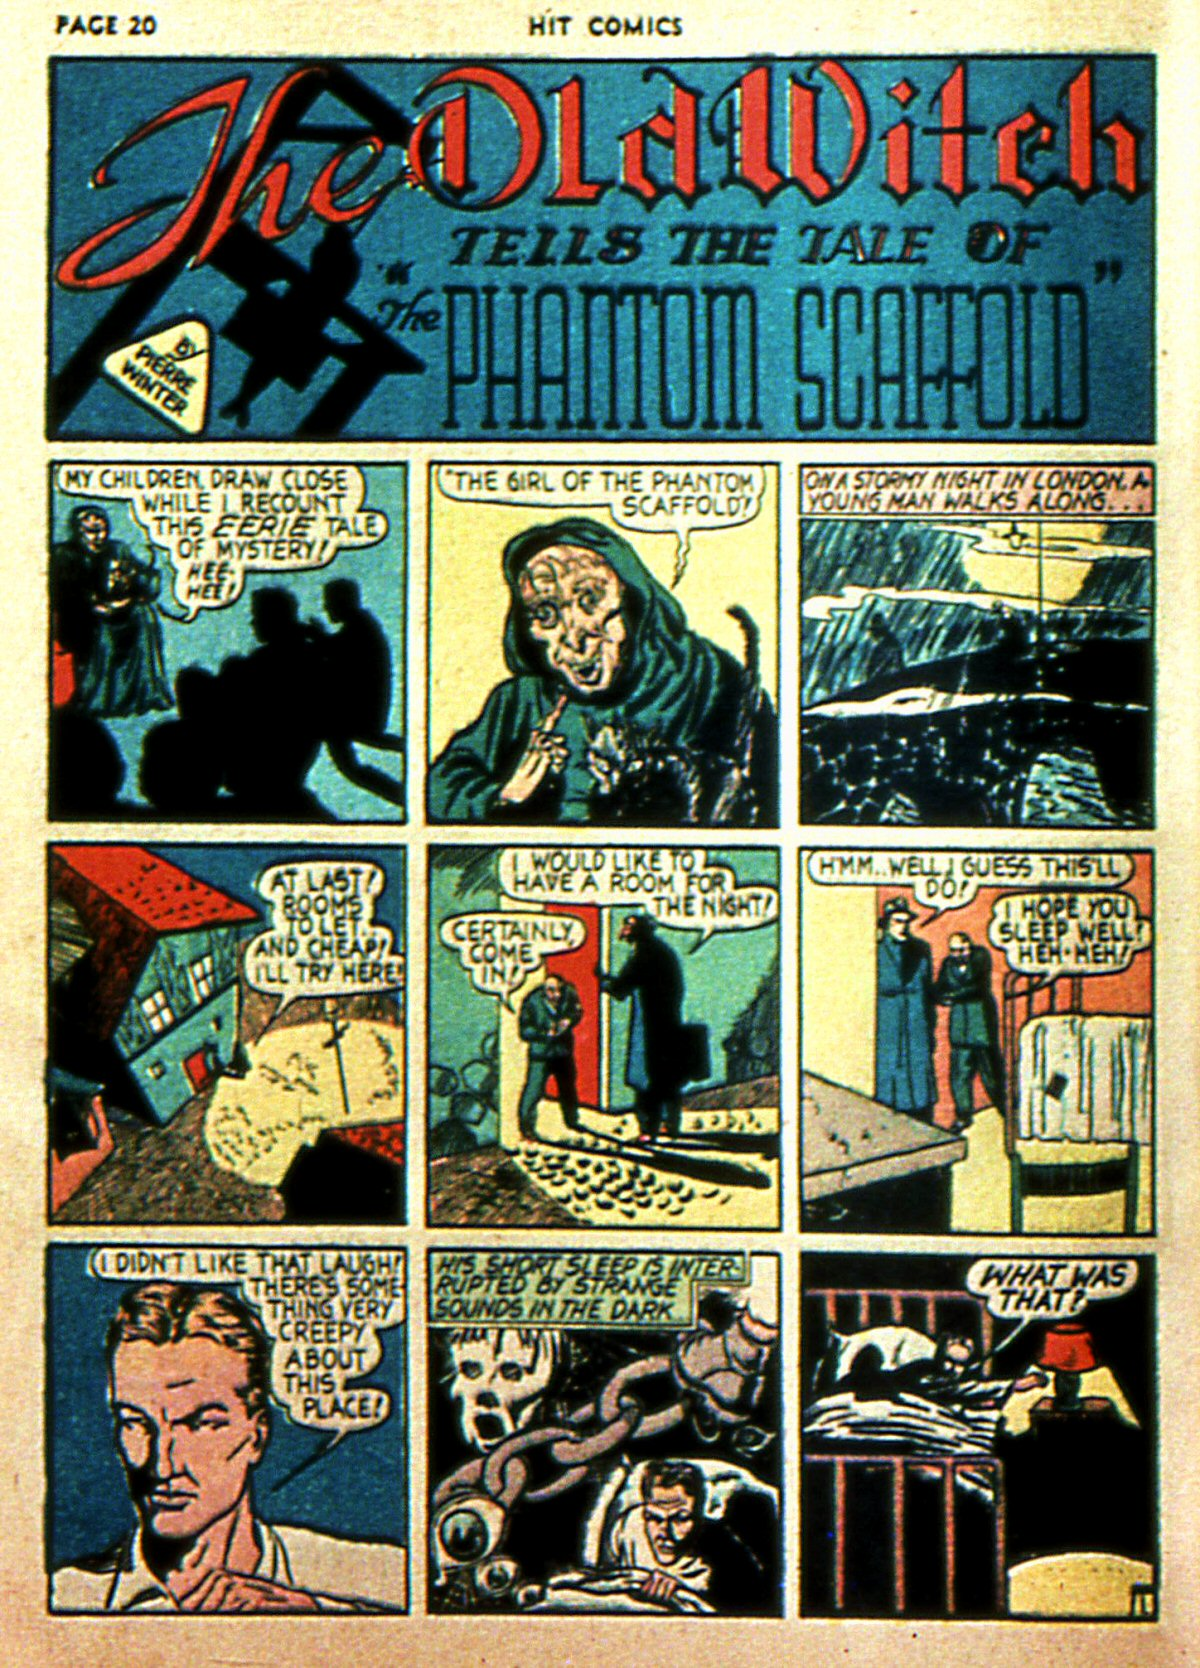 Read online Hit Comics comic -  Issue #2 - 22